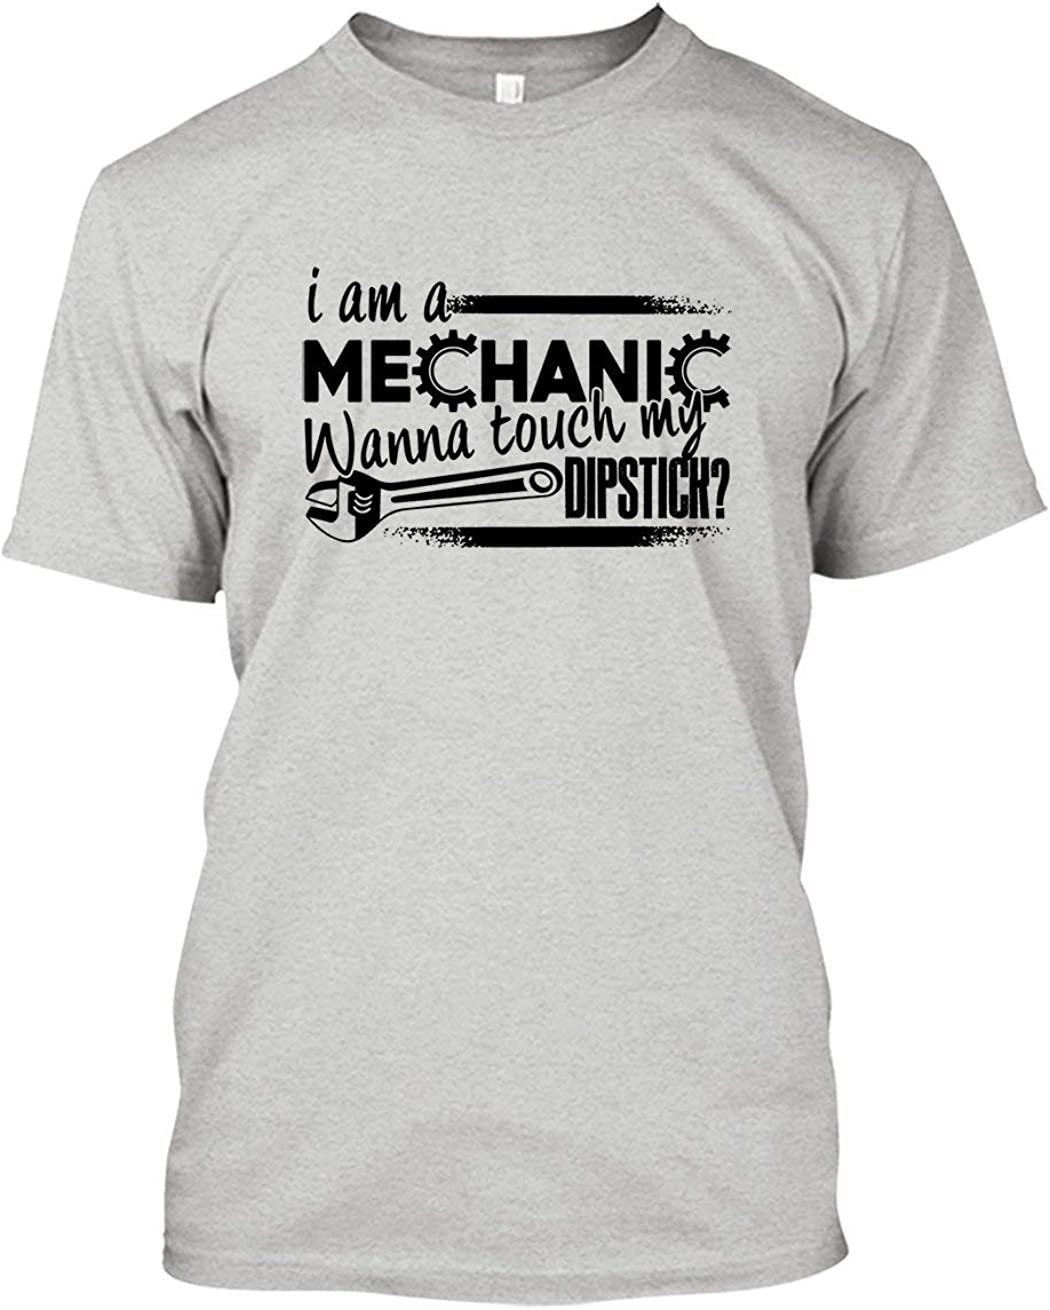 Atomic garage T-Shirt usa custom engine pinup mechanic T-Shirt Mens Long Sleeve